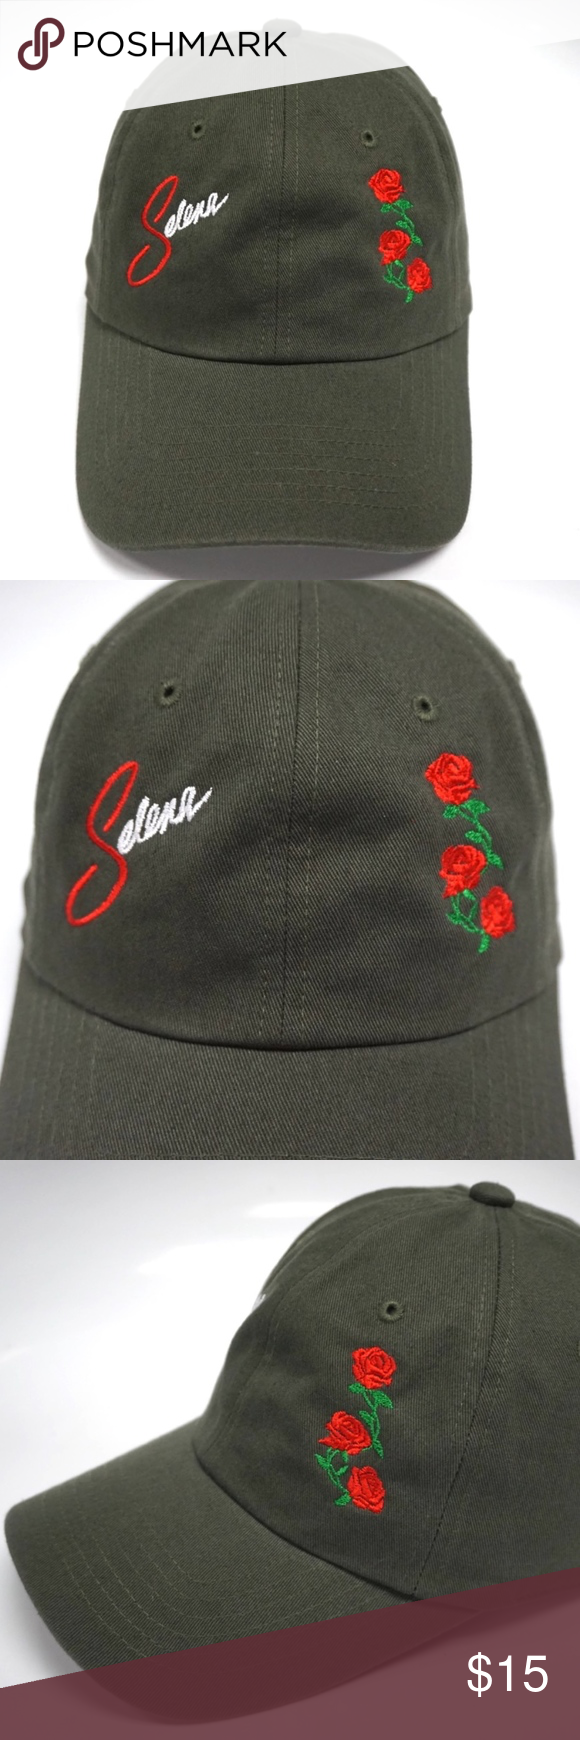 ea9d9157 Selena Rose Dad Hat Slouch Cap Selena Rose Dad Hat Color: Olive Condition:  Brand